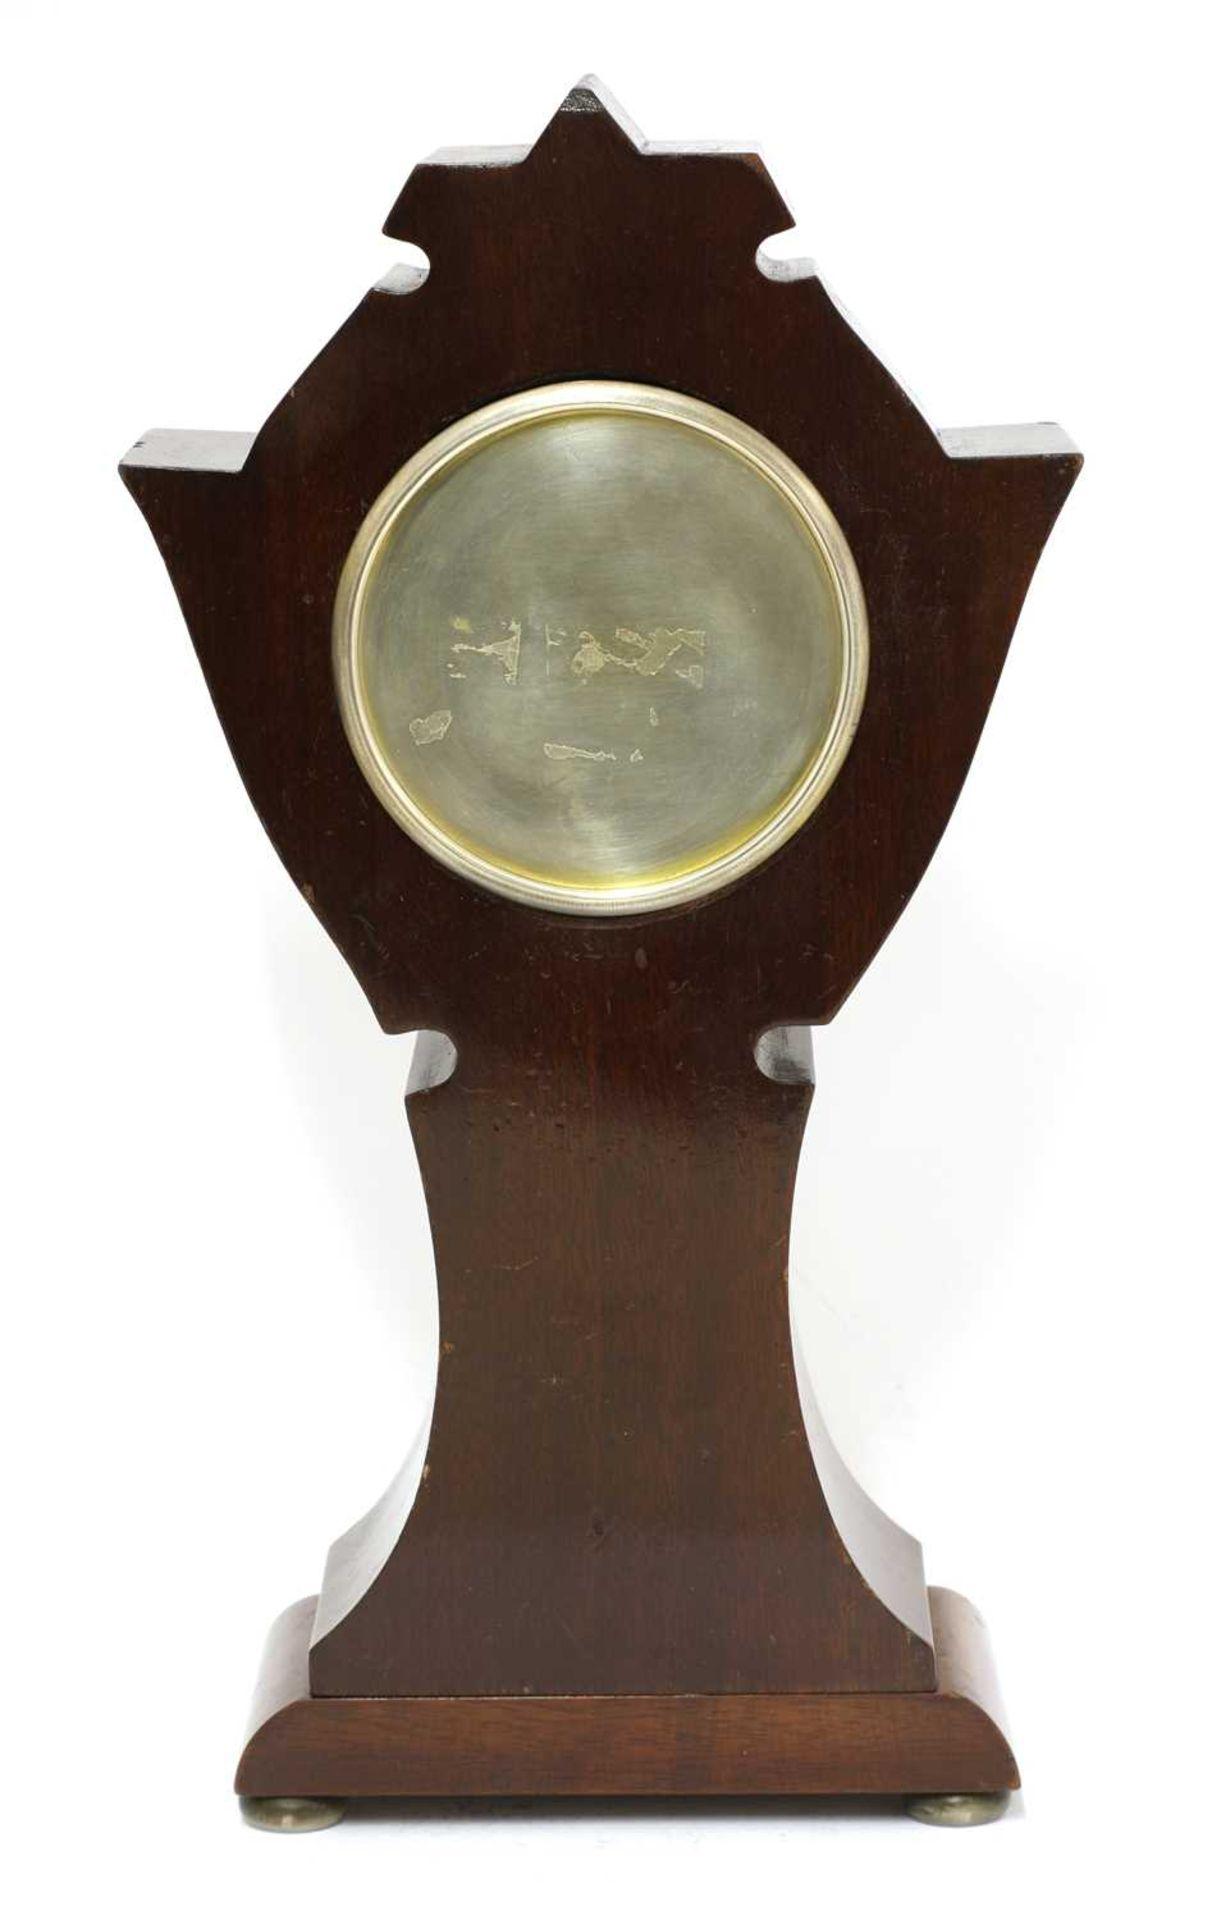 An Art Nouveau silver-mounted mantel clock, - Image 3 of 4